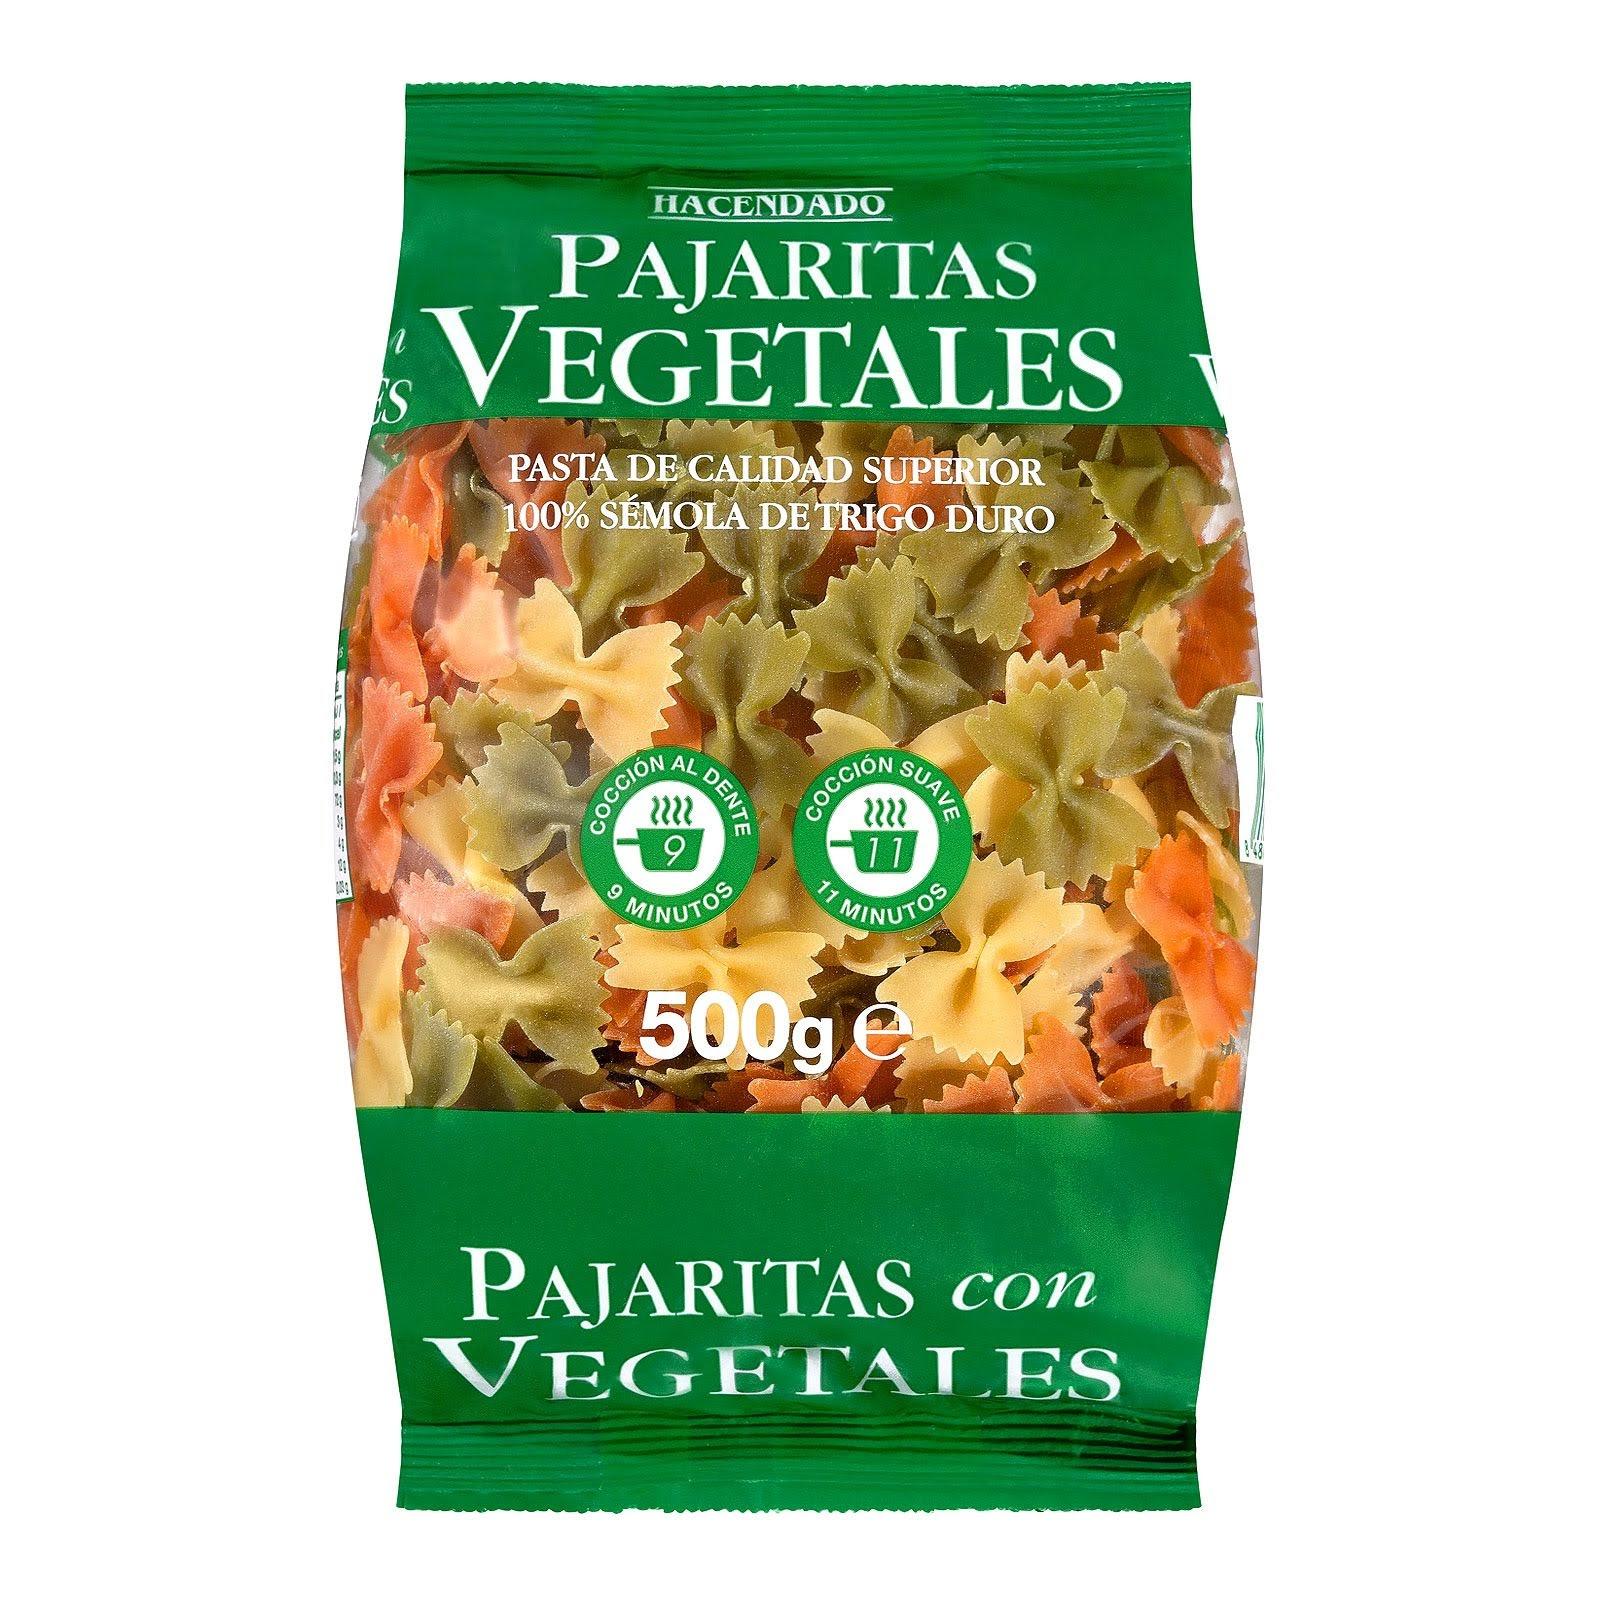 Pajaritas vegetales Hacendado